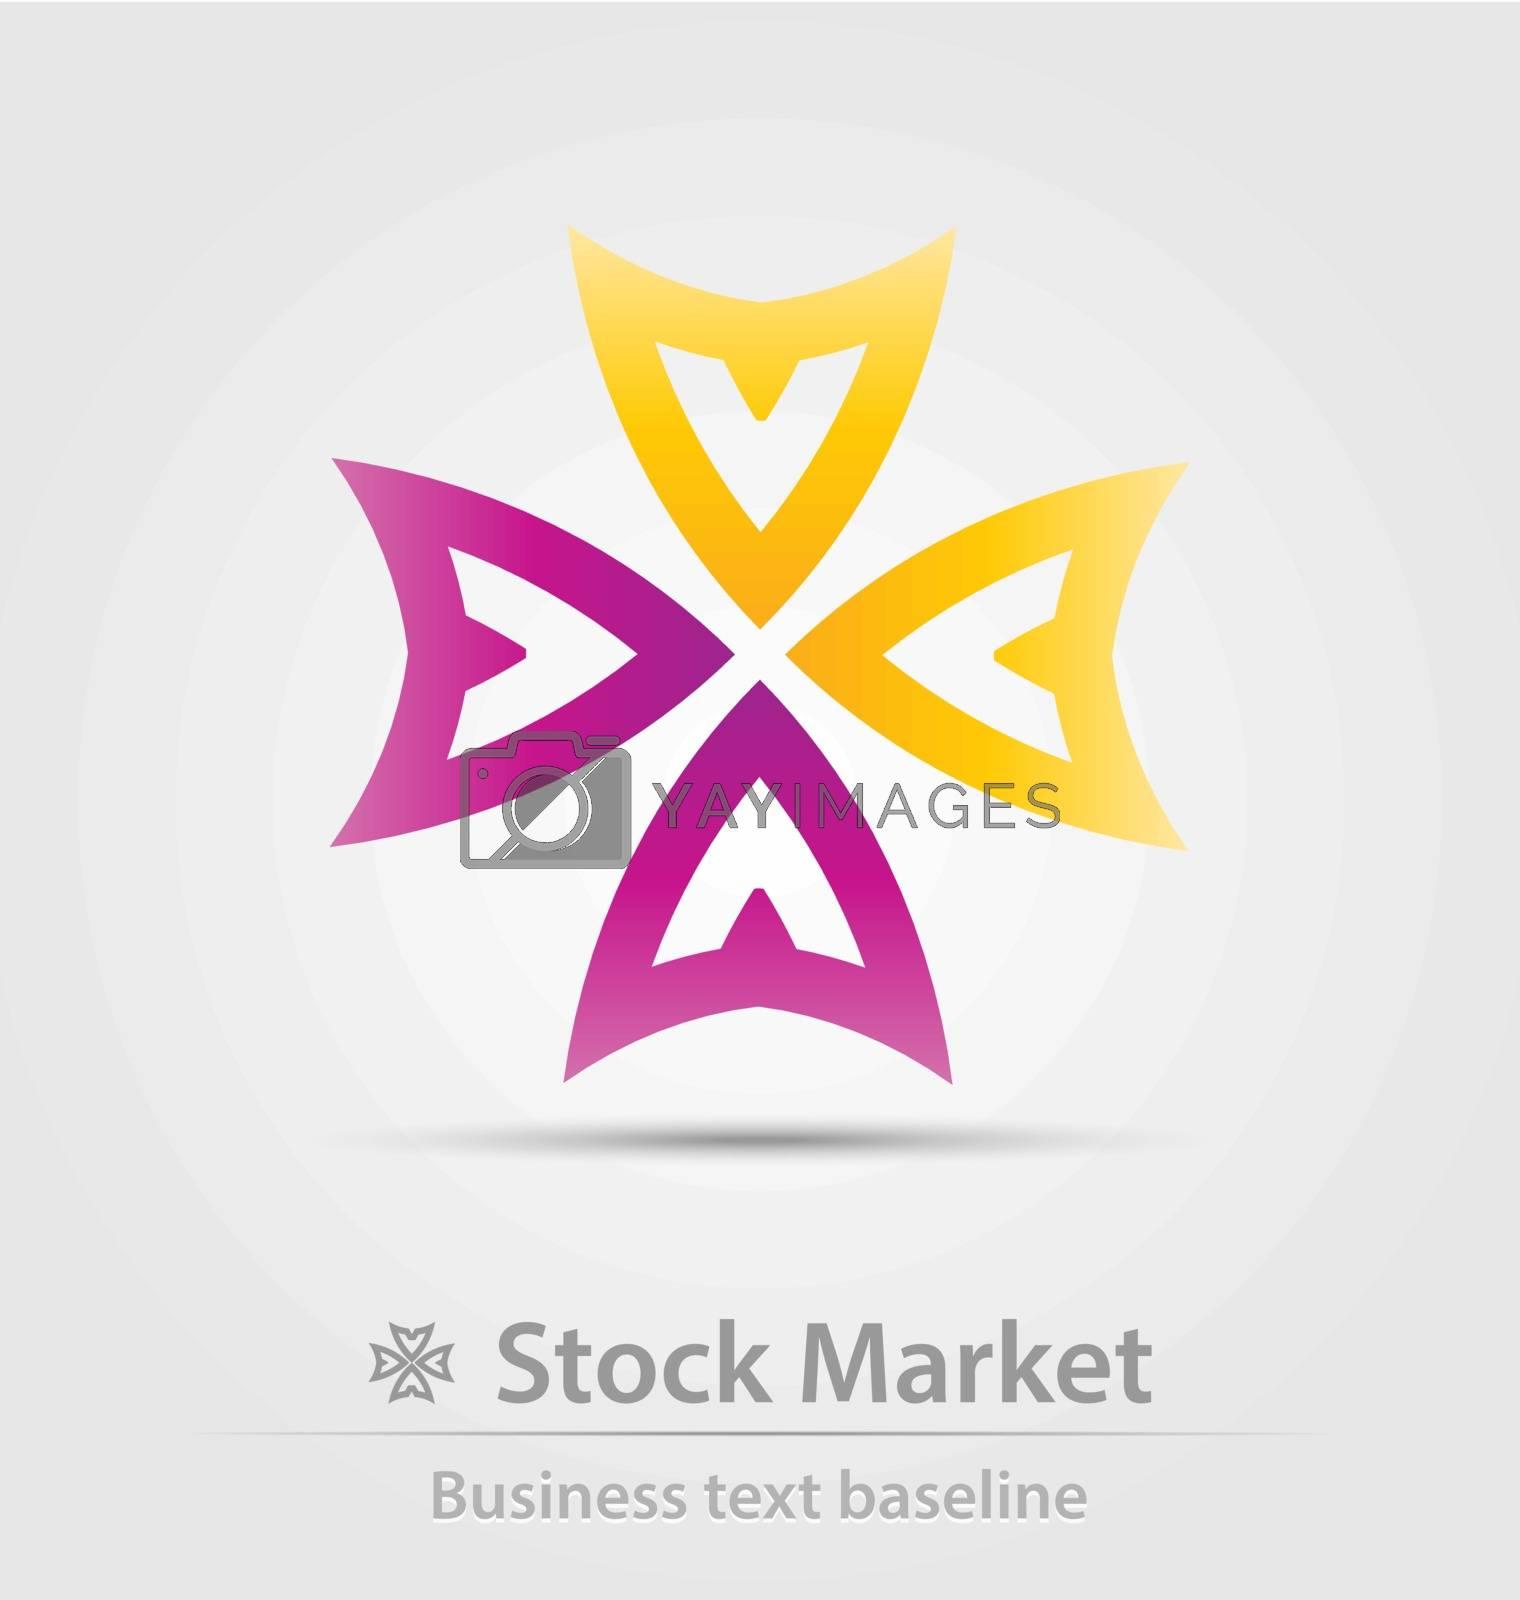 Stock market business icon for creative design